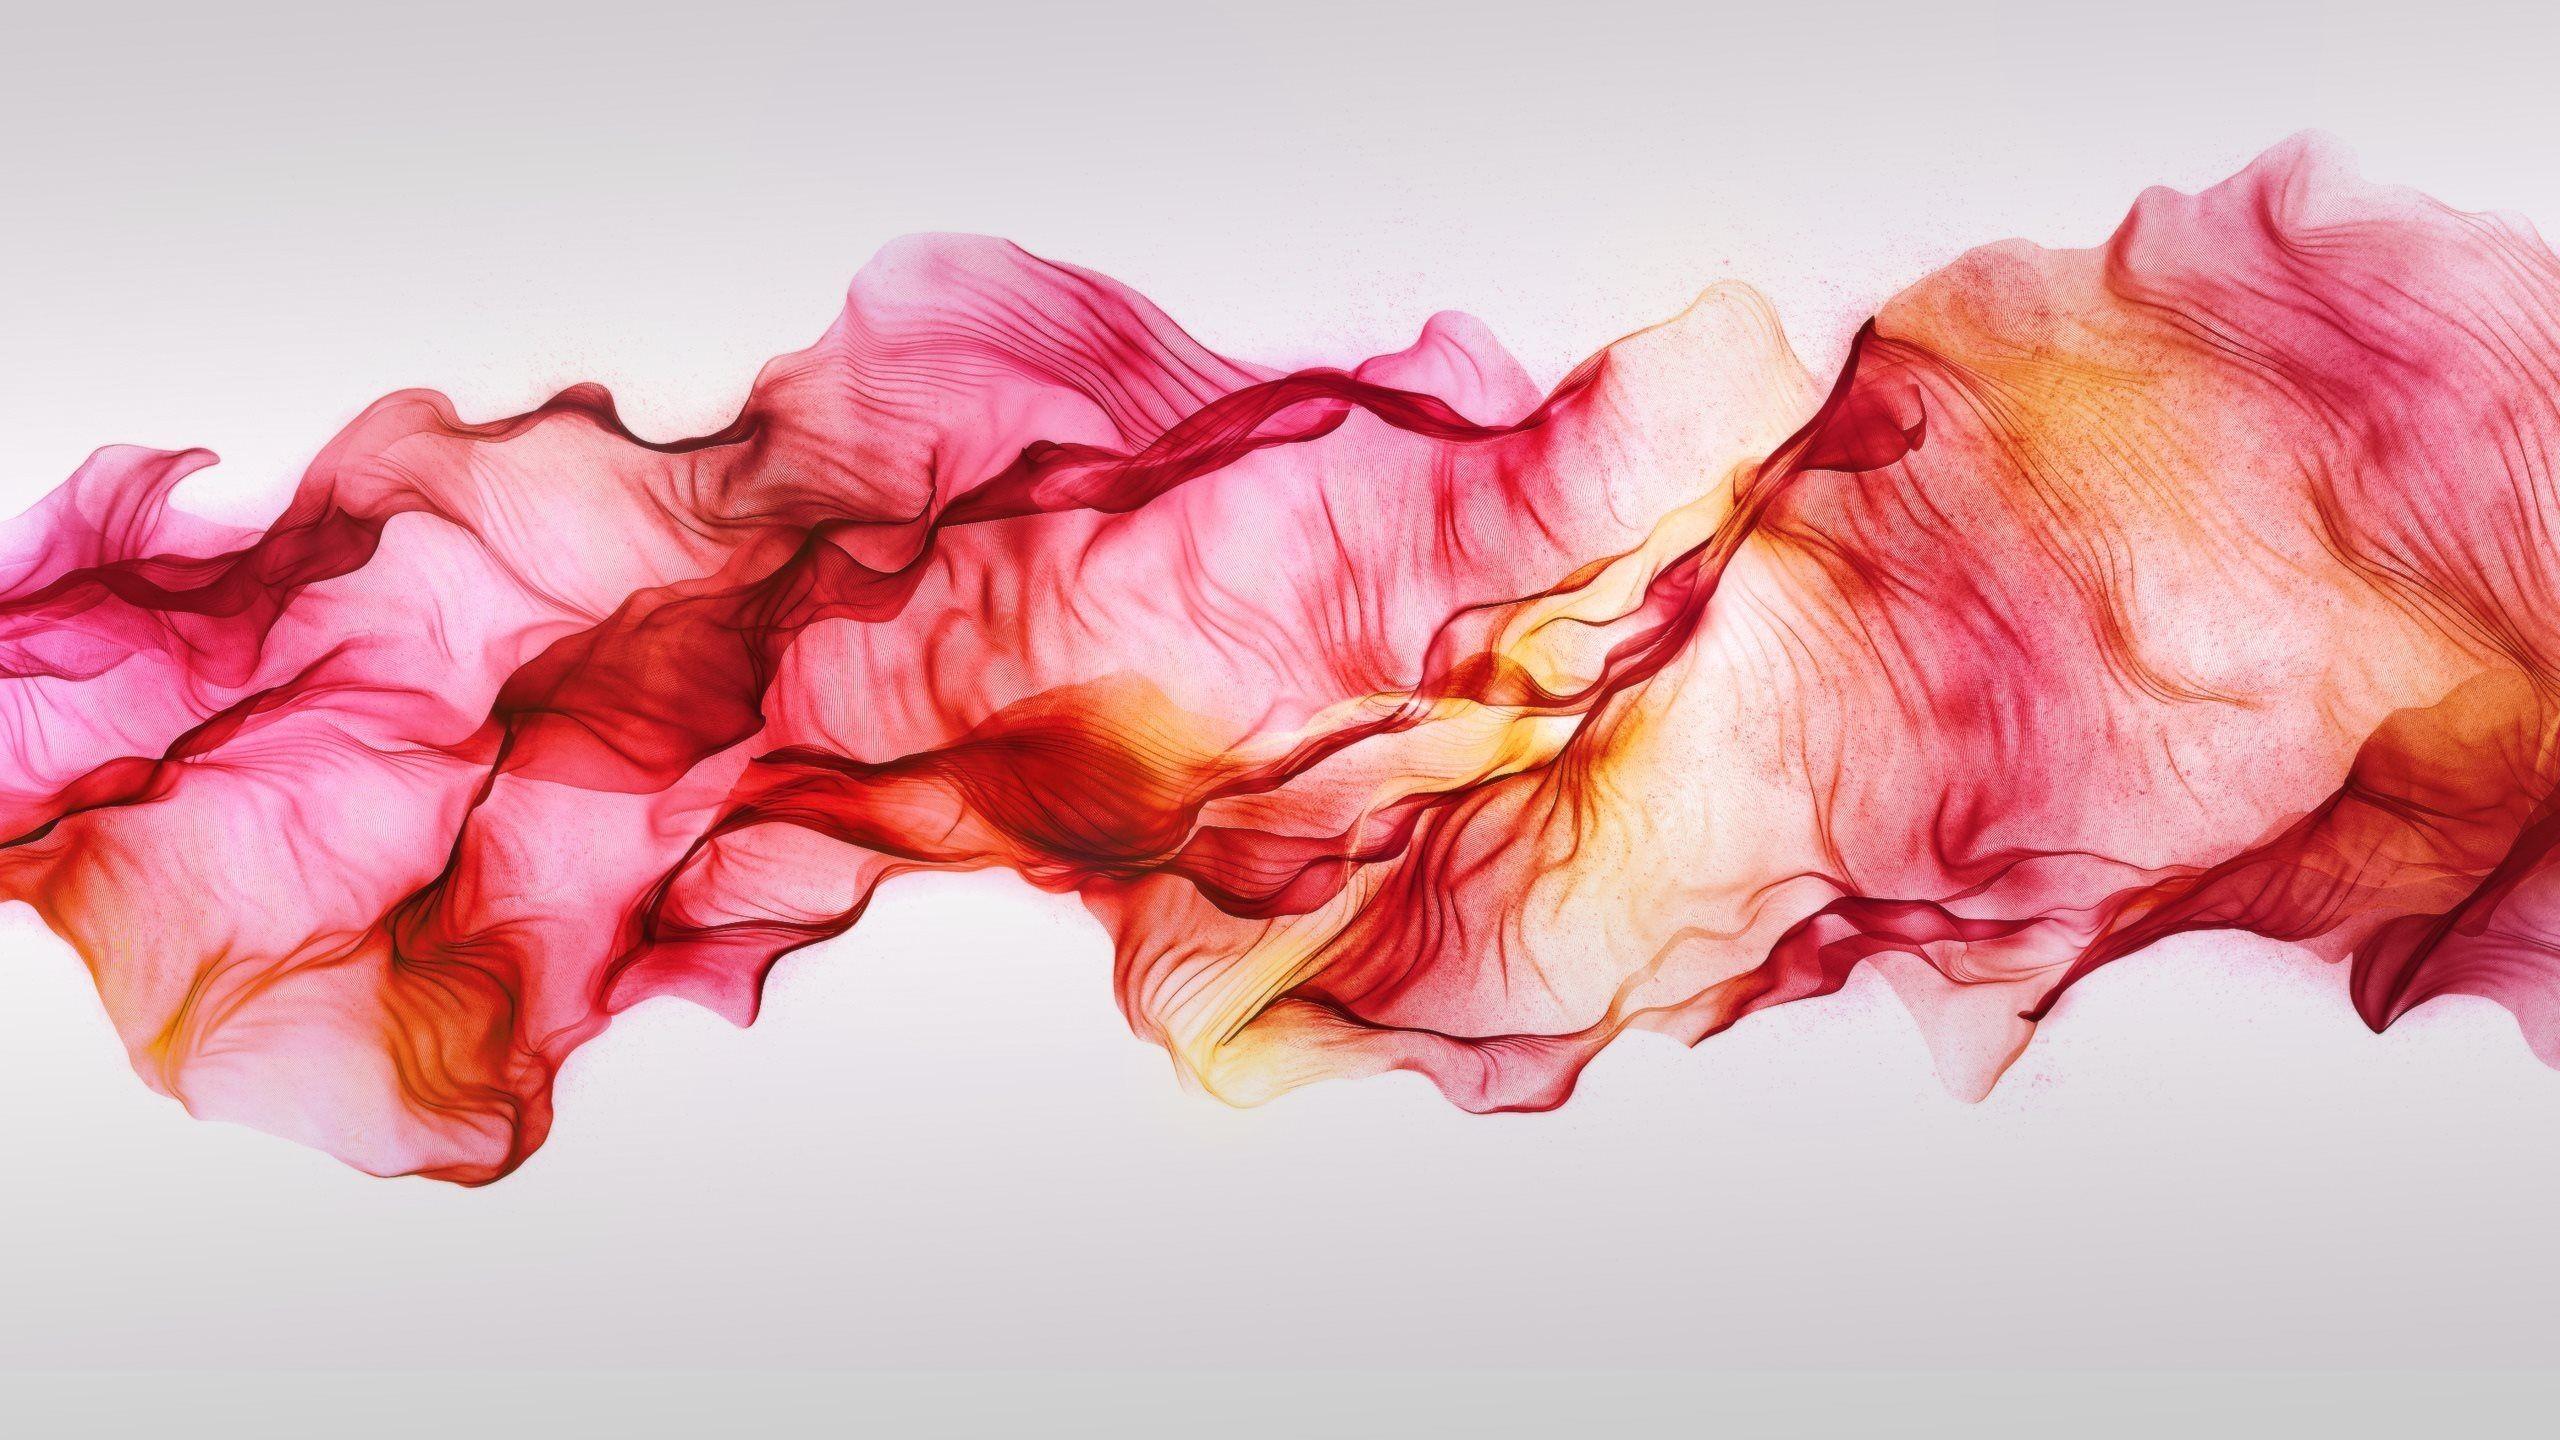 wallpaper.wiki-Colorful-Smoke-Wallpapers-HD-Free-Download-